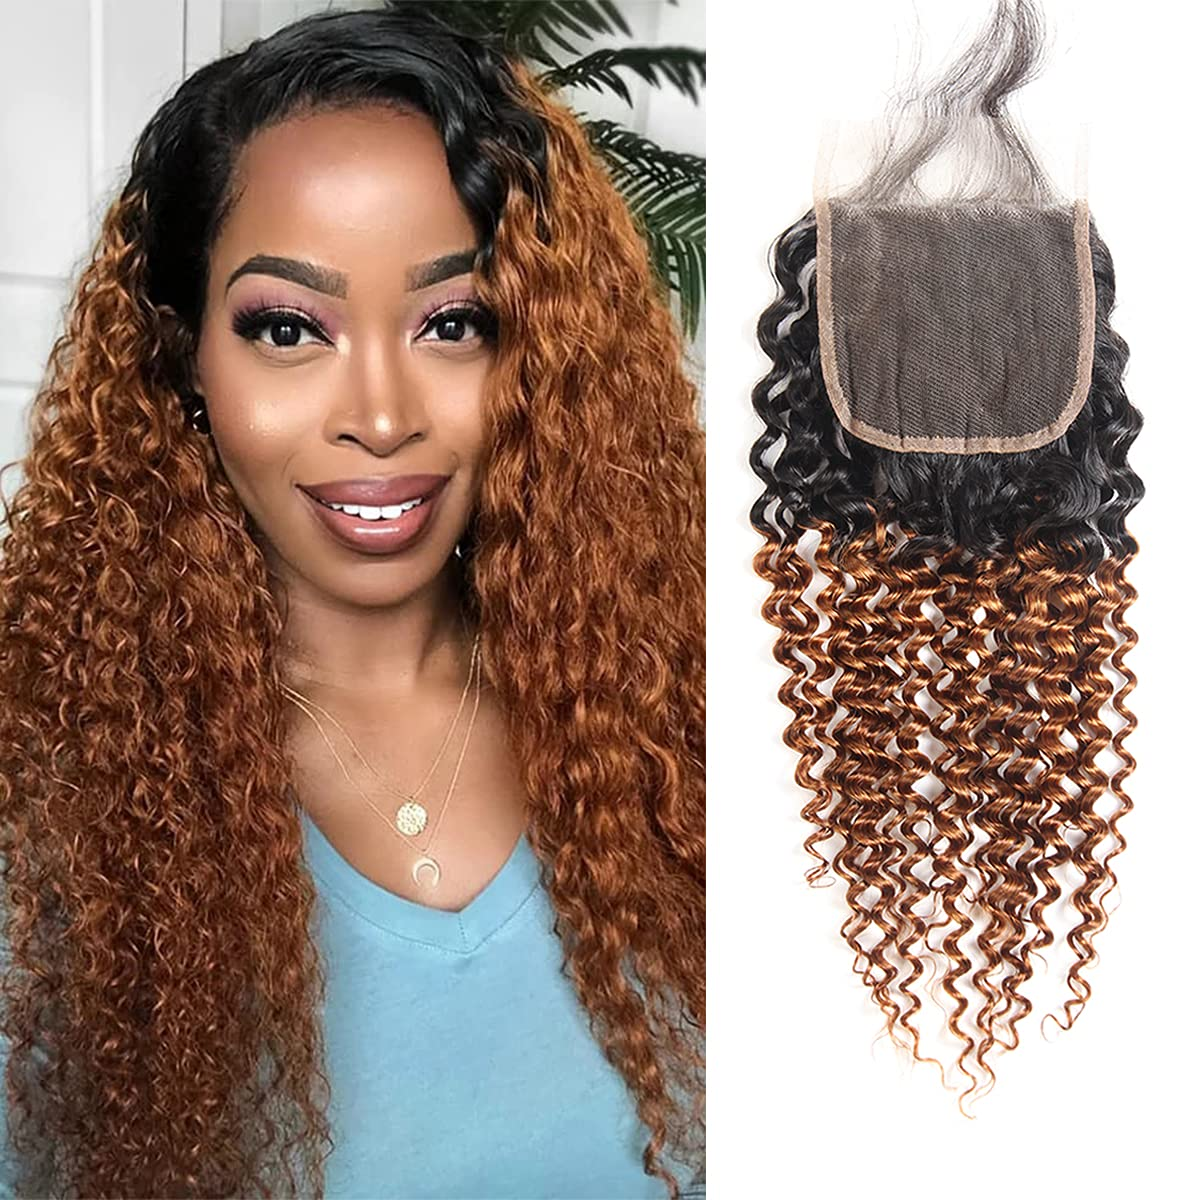 Branded goods Brazilian Kinky wholesale Curly Human Hair Extension Brown 30 Swiss 1B 4x4